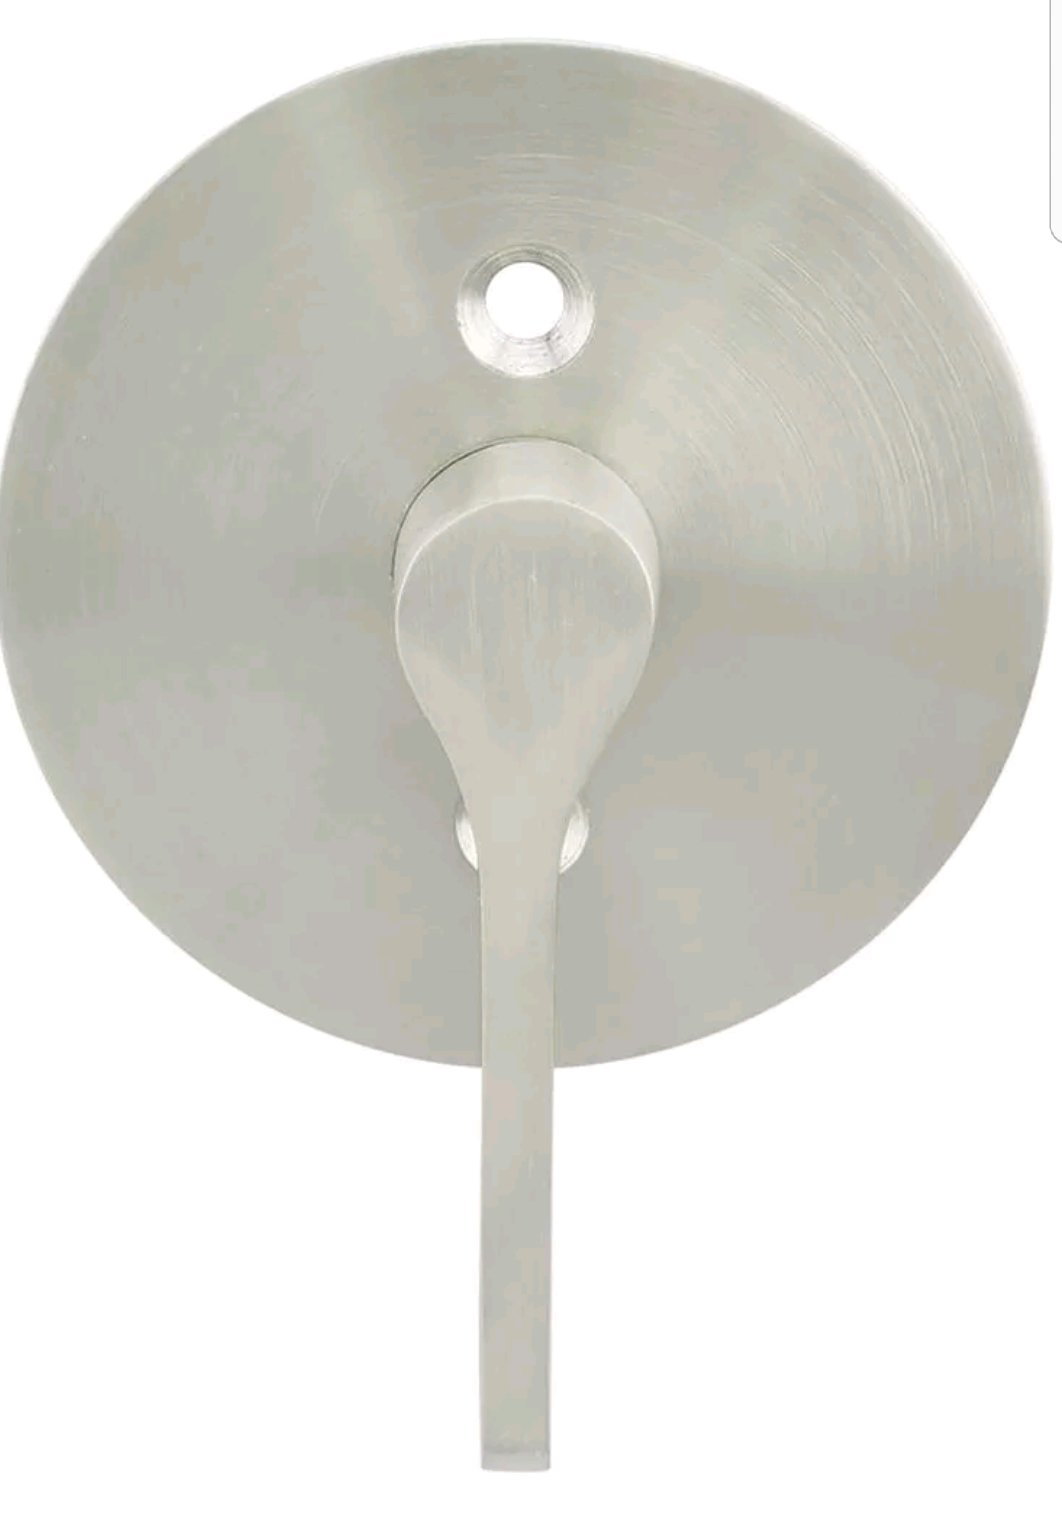 INOX EC1217-BD4214-32D 2-1/4'' BS TT17 ADA Turn Barn Door Privacy Lock with Round Rose, 2.25'' Face, Satin Stainless Steel